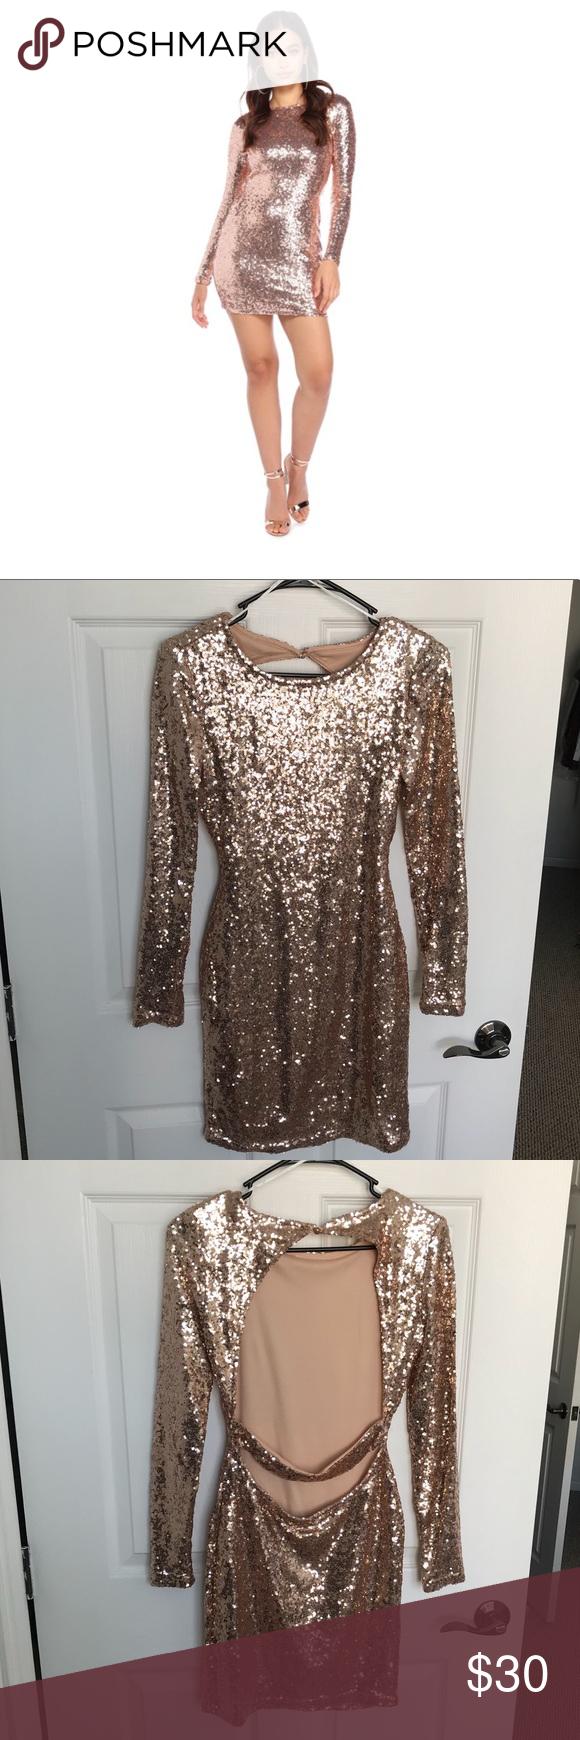 Windsor ucrose gold sequin bar dressud worn once for party usual wear